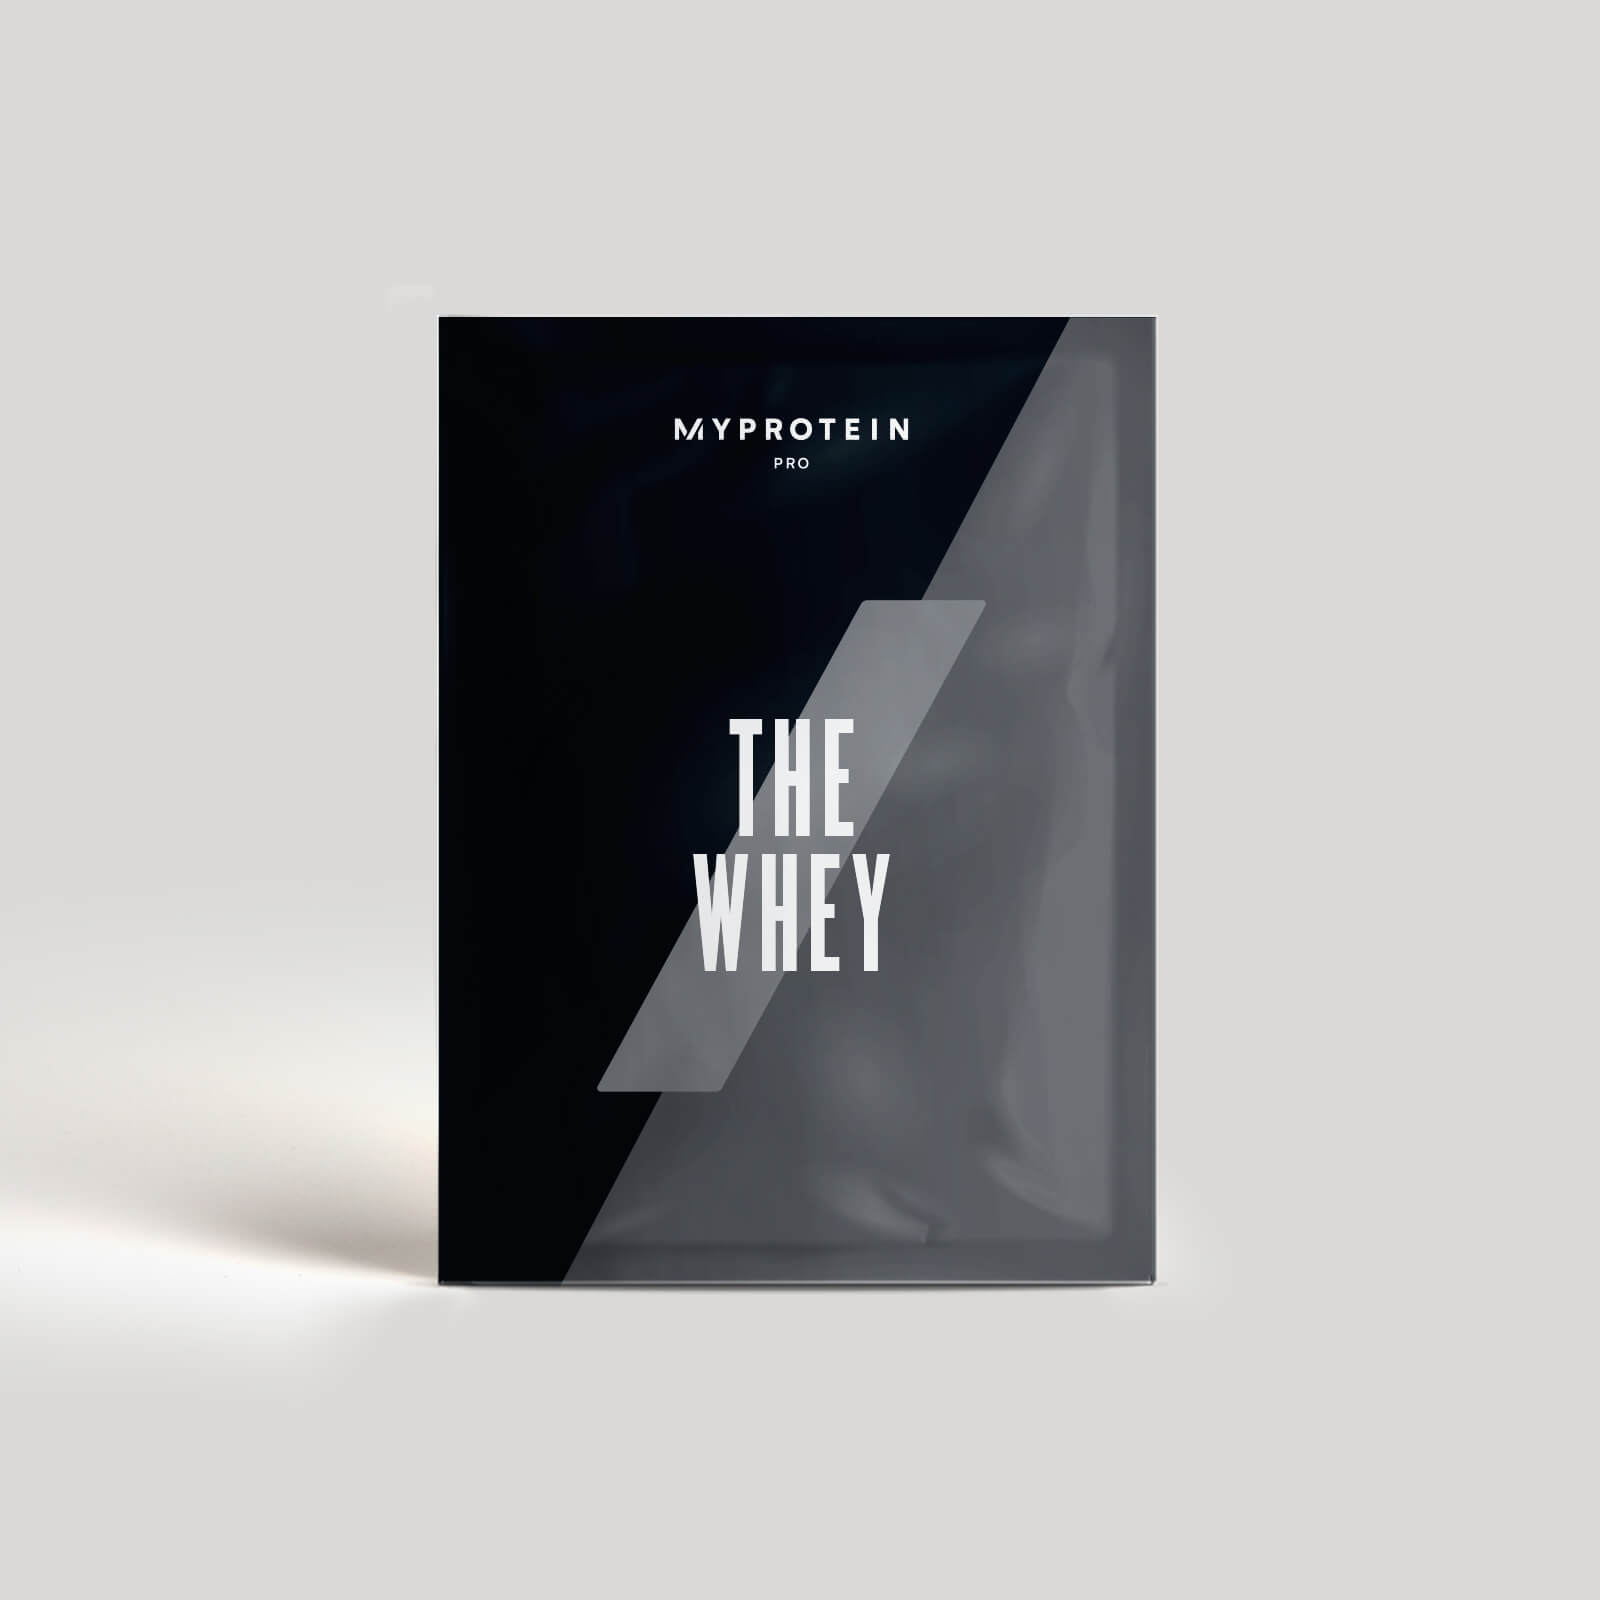 Thewhey (Échantillon) - 1Sachets - Nouveau - Caramel salé